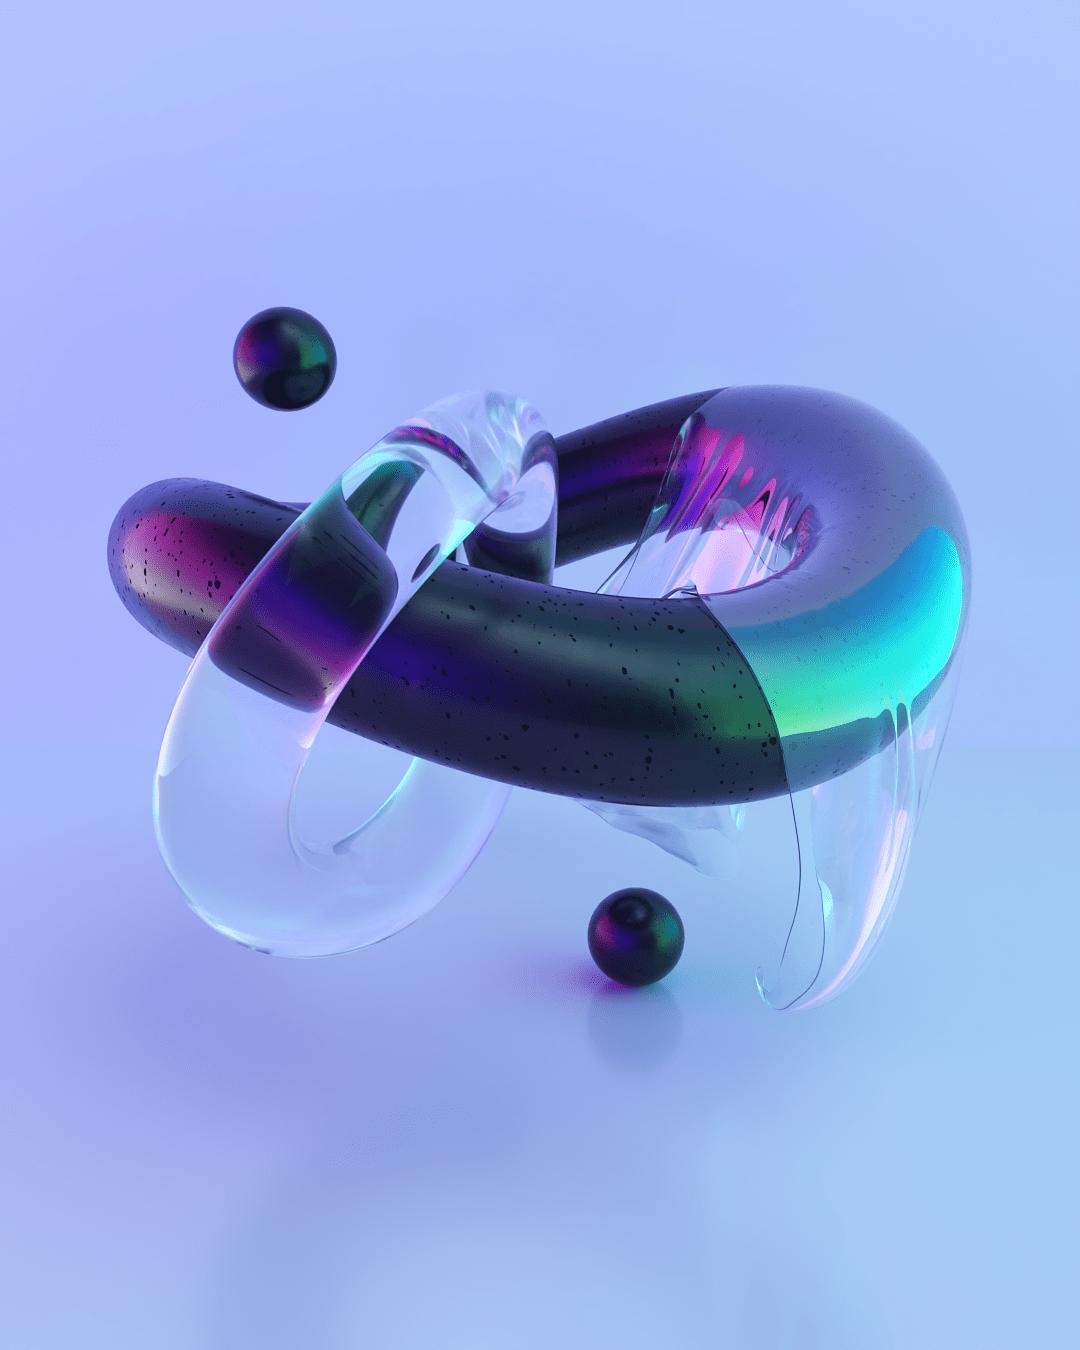 3D 3d render abstract light lights materials neon Render Retro shapes